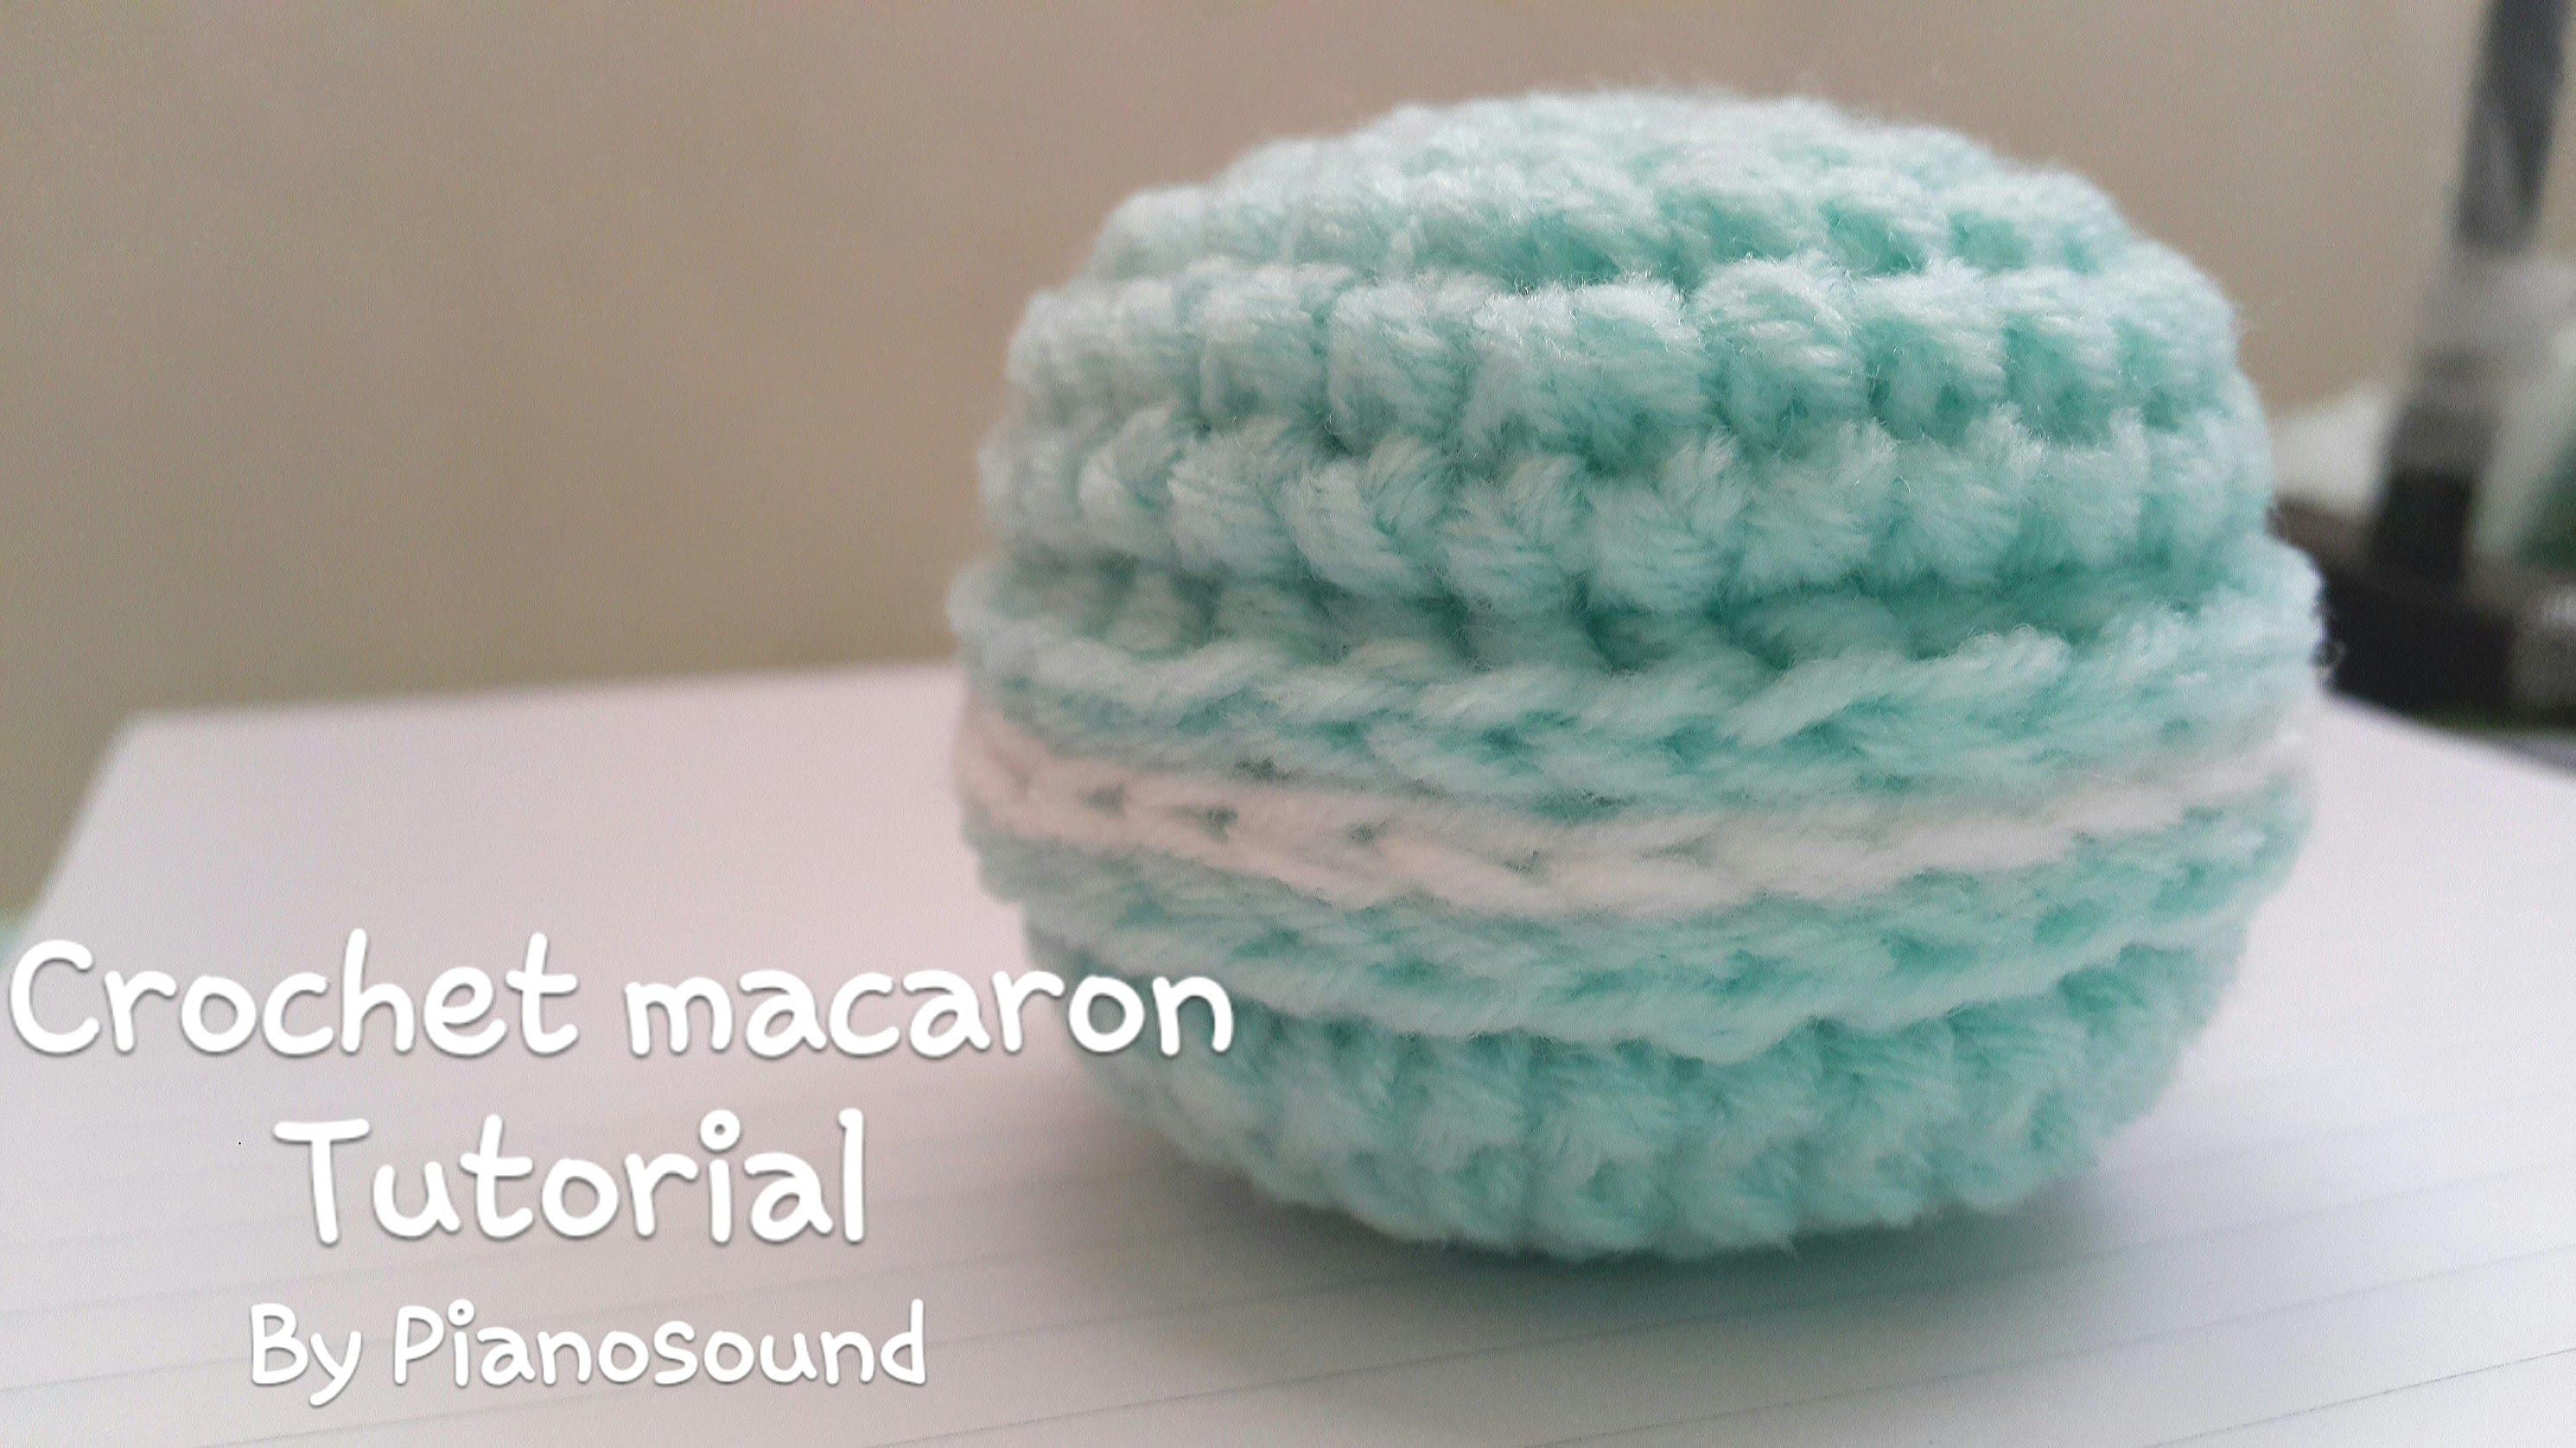 Tutorial Macaron crochet